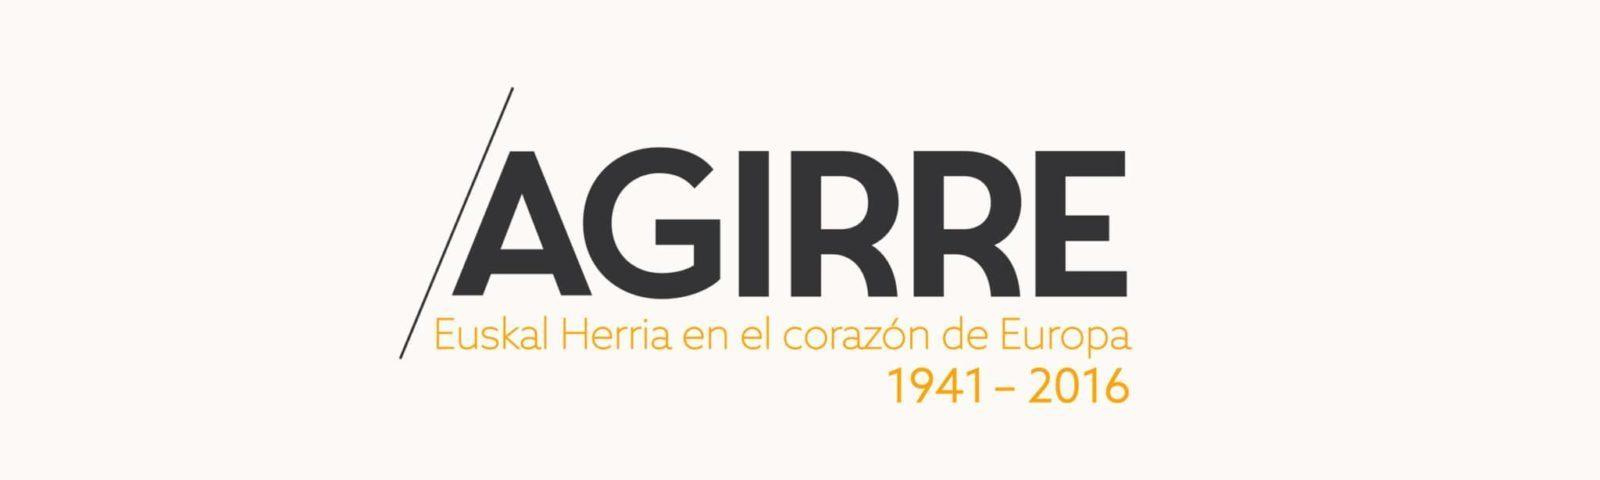 Sirope-Proyectos-lehendakari-agirre-berlin-cabecera3-branding-agencia-creatividad